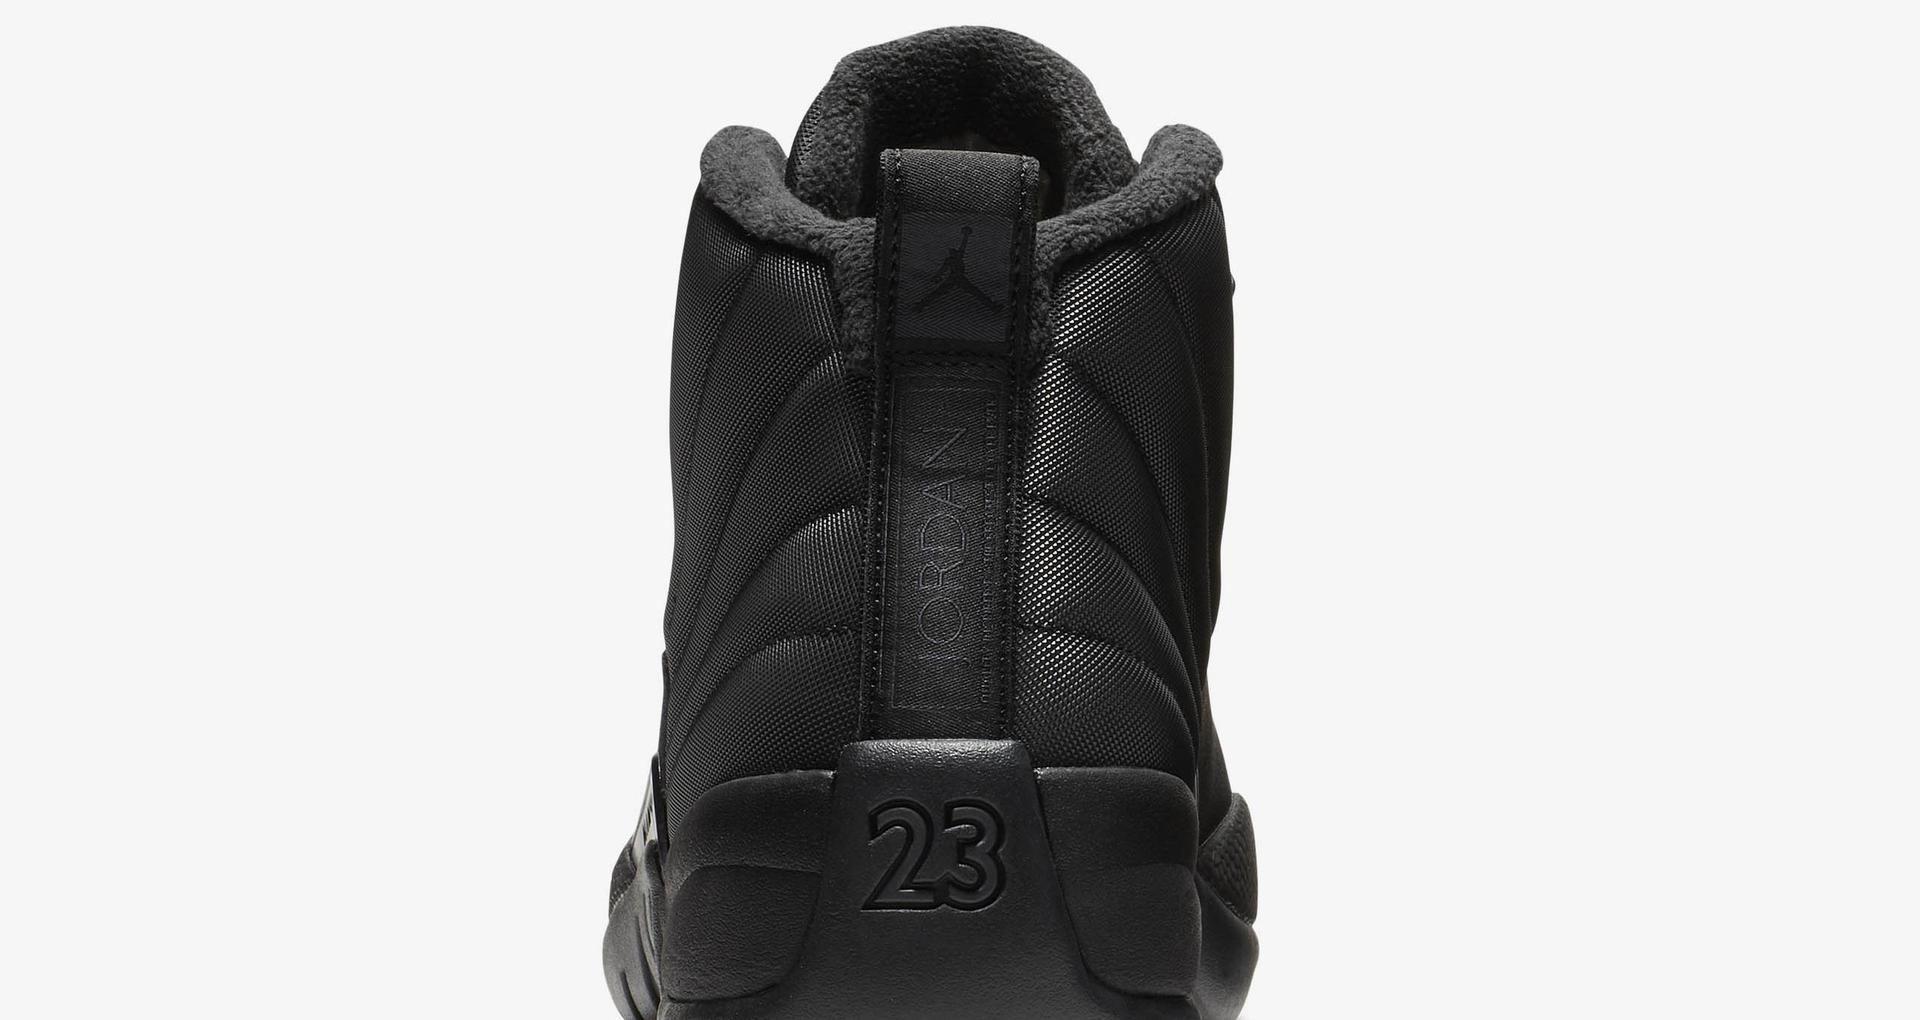 separation shoes 7fb49 fcd0d Air Jordan 12 Retro Winter 'Black & Anthracite' Release Date ...